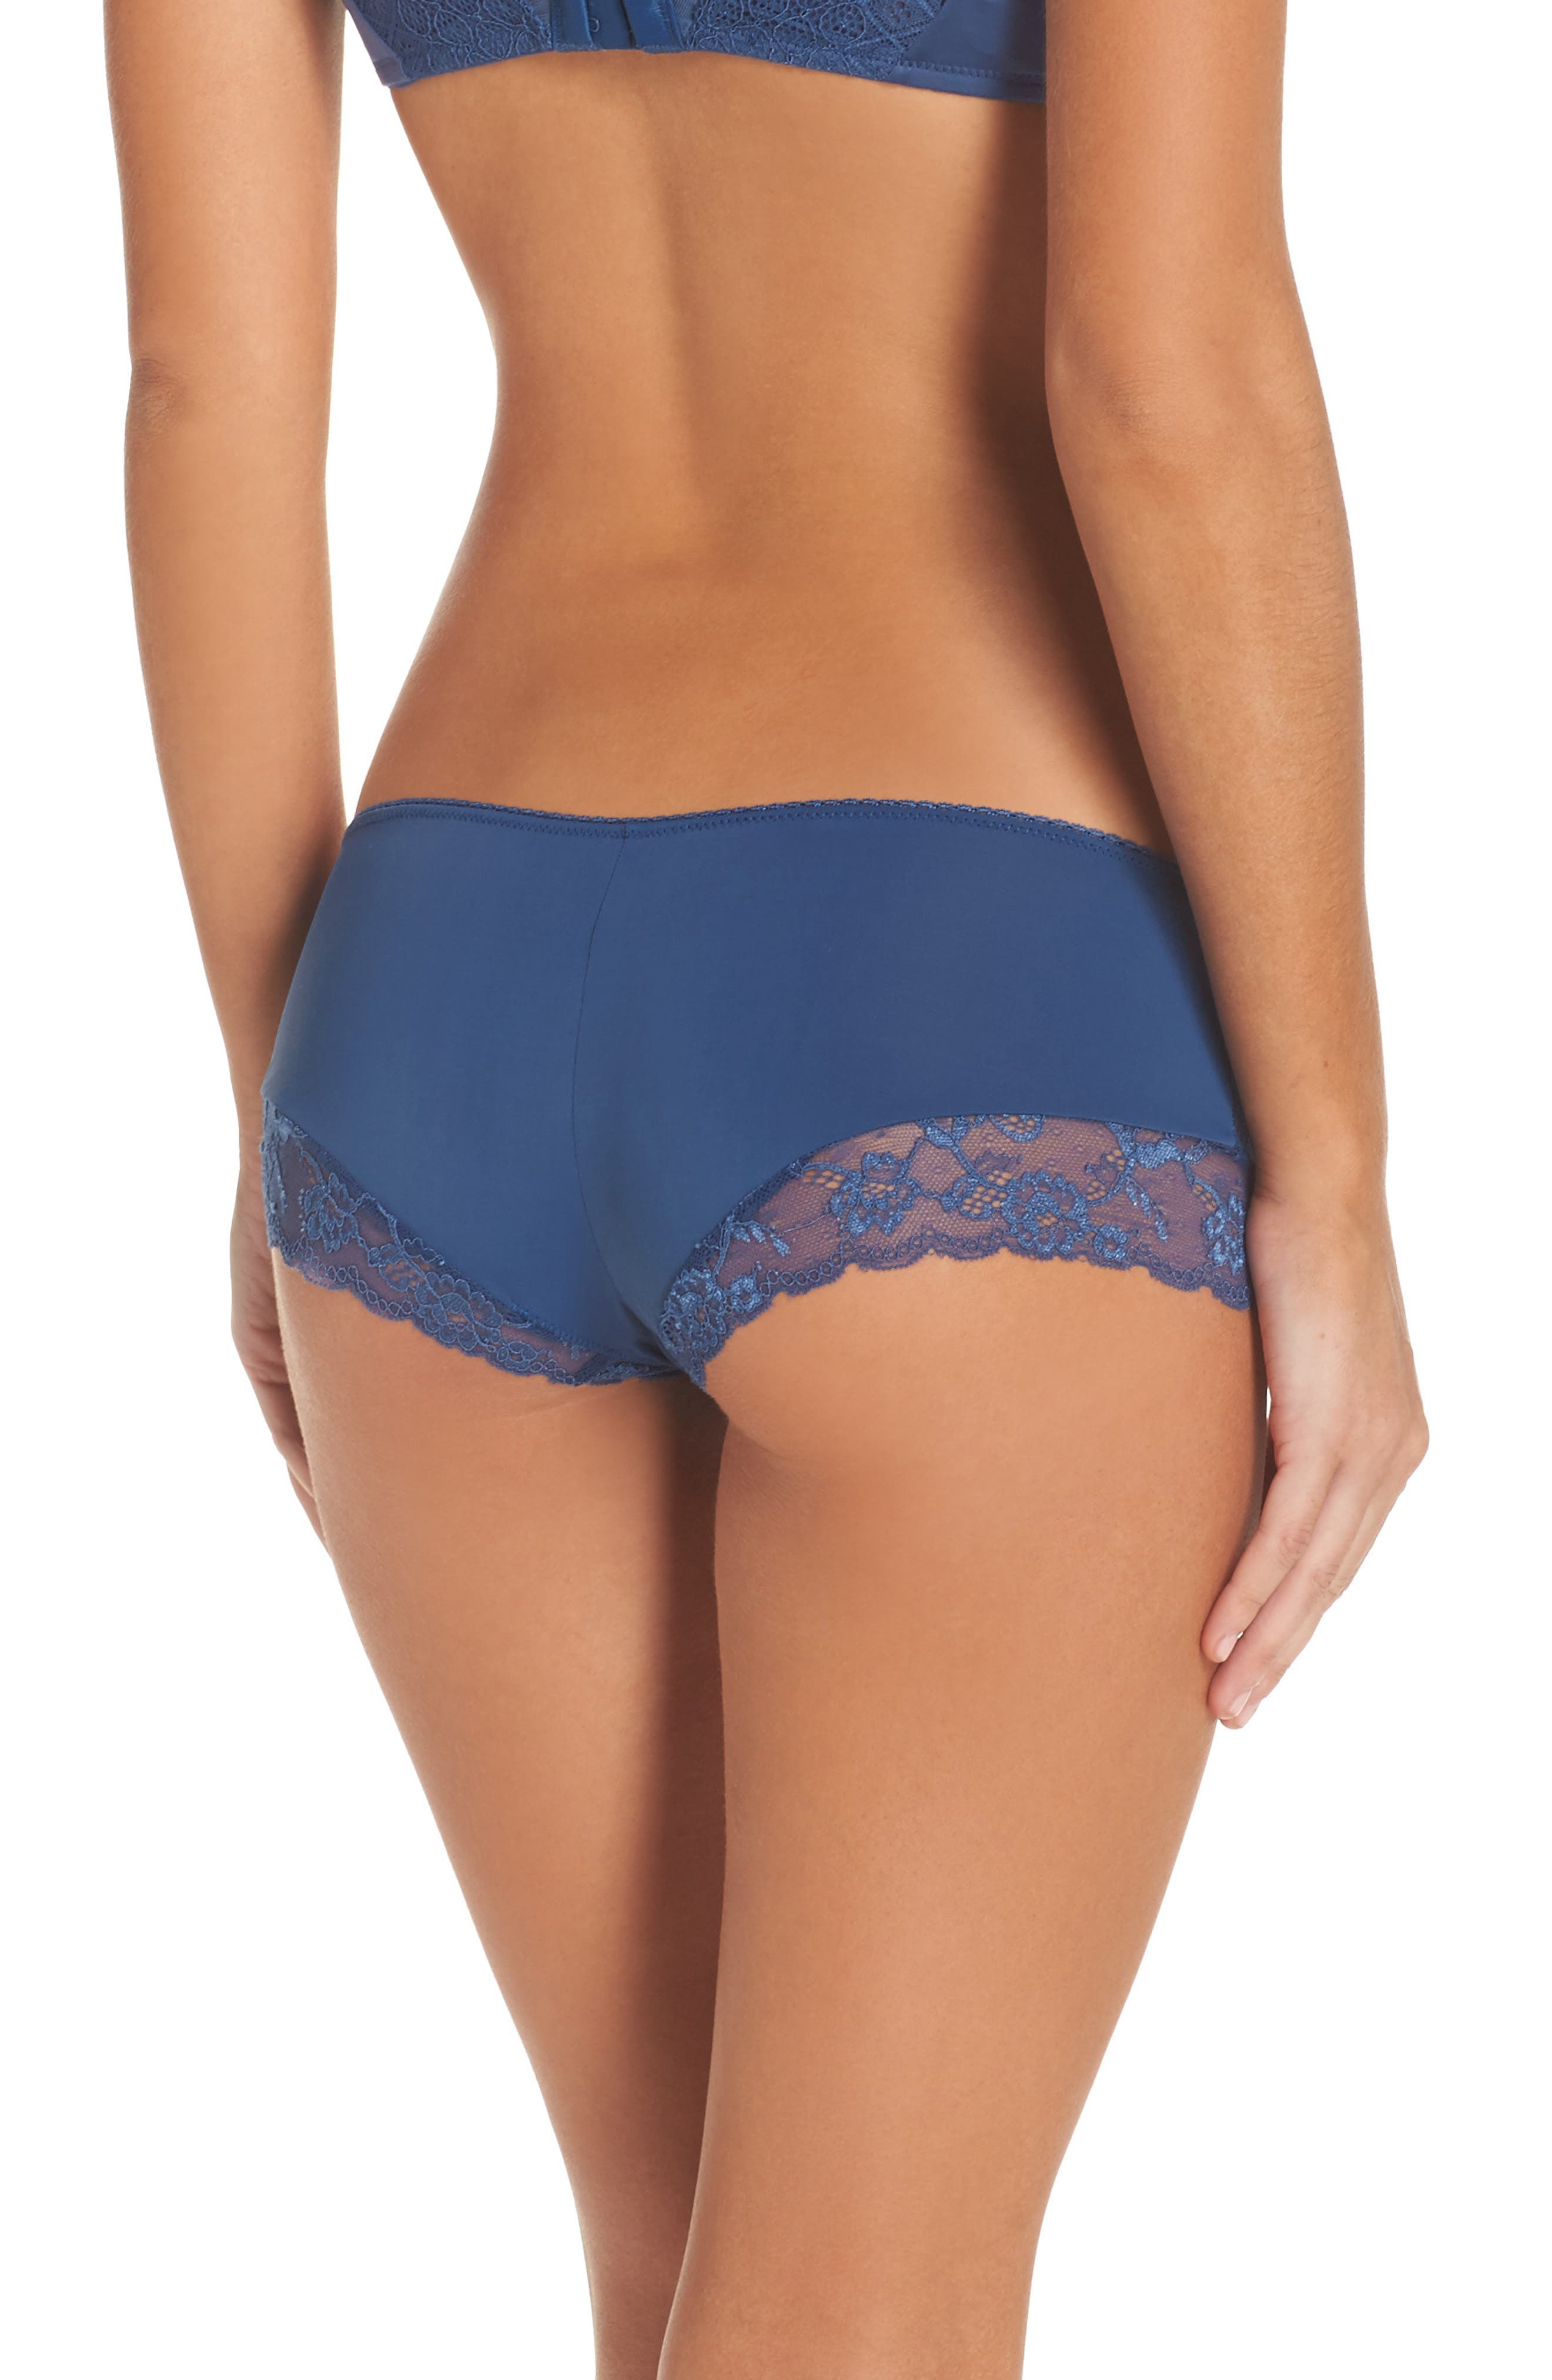 Alternate Image 2  - Honeydew Microfiber & Lace Hipster Panties (3 for $33)